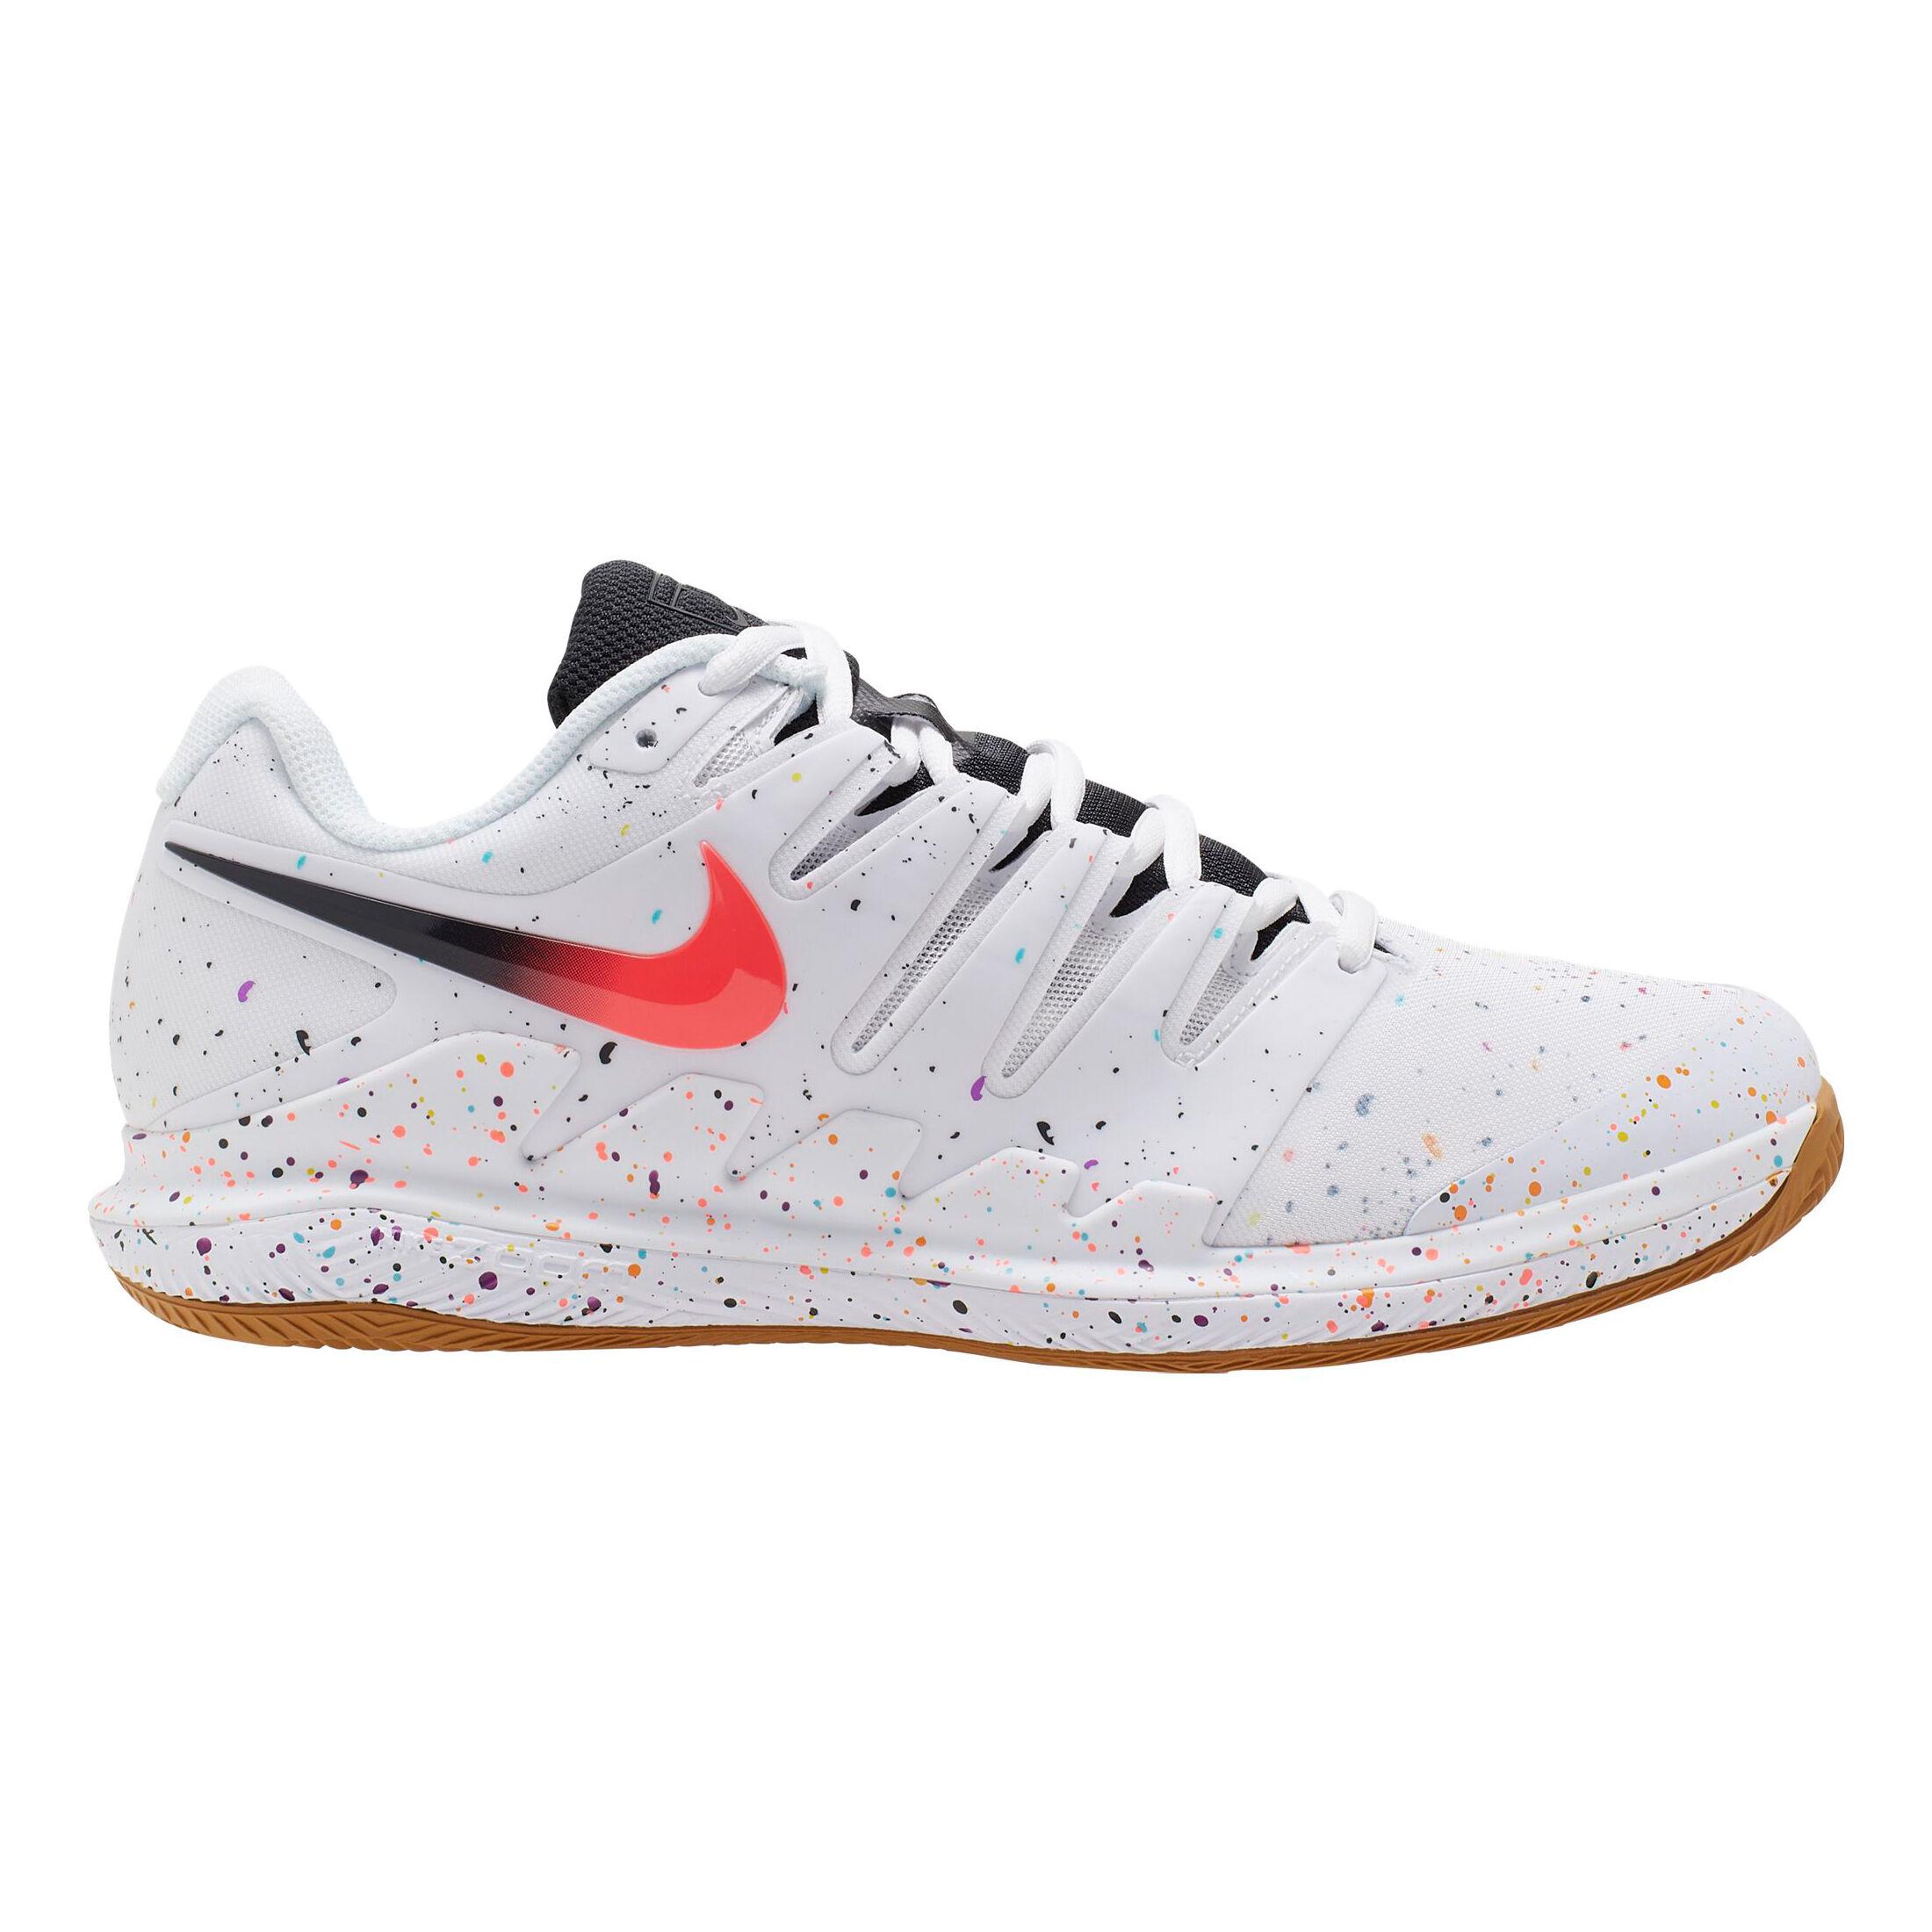 Nike Zoom Vapor X Clay Sandplatzschuh Herren Koralle